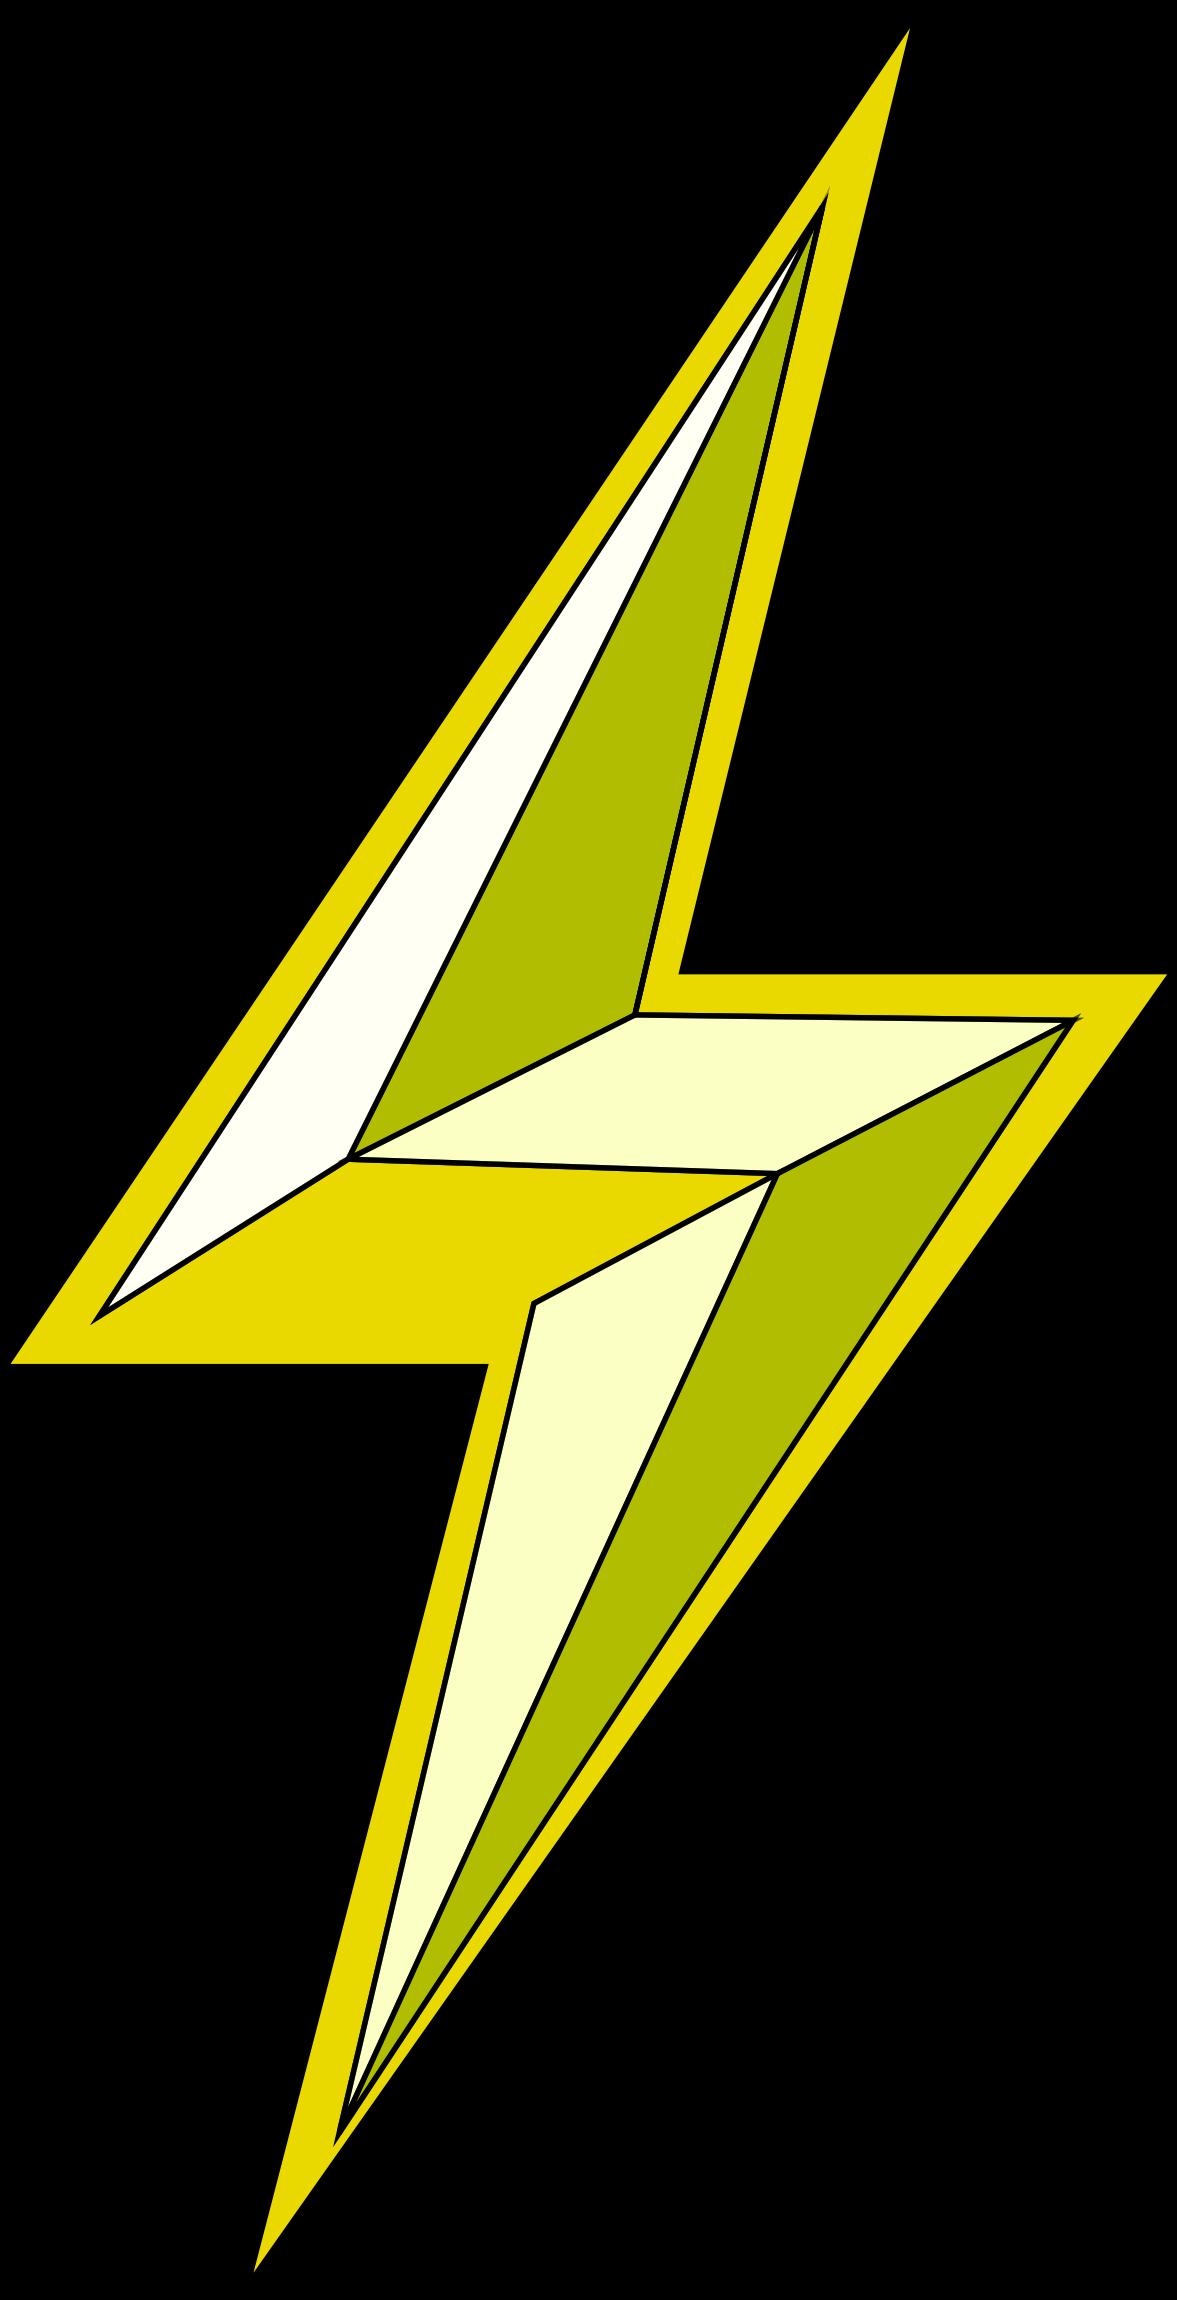 Lightning bolt big image. D20 clipart stylized